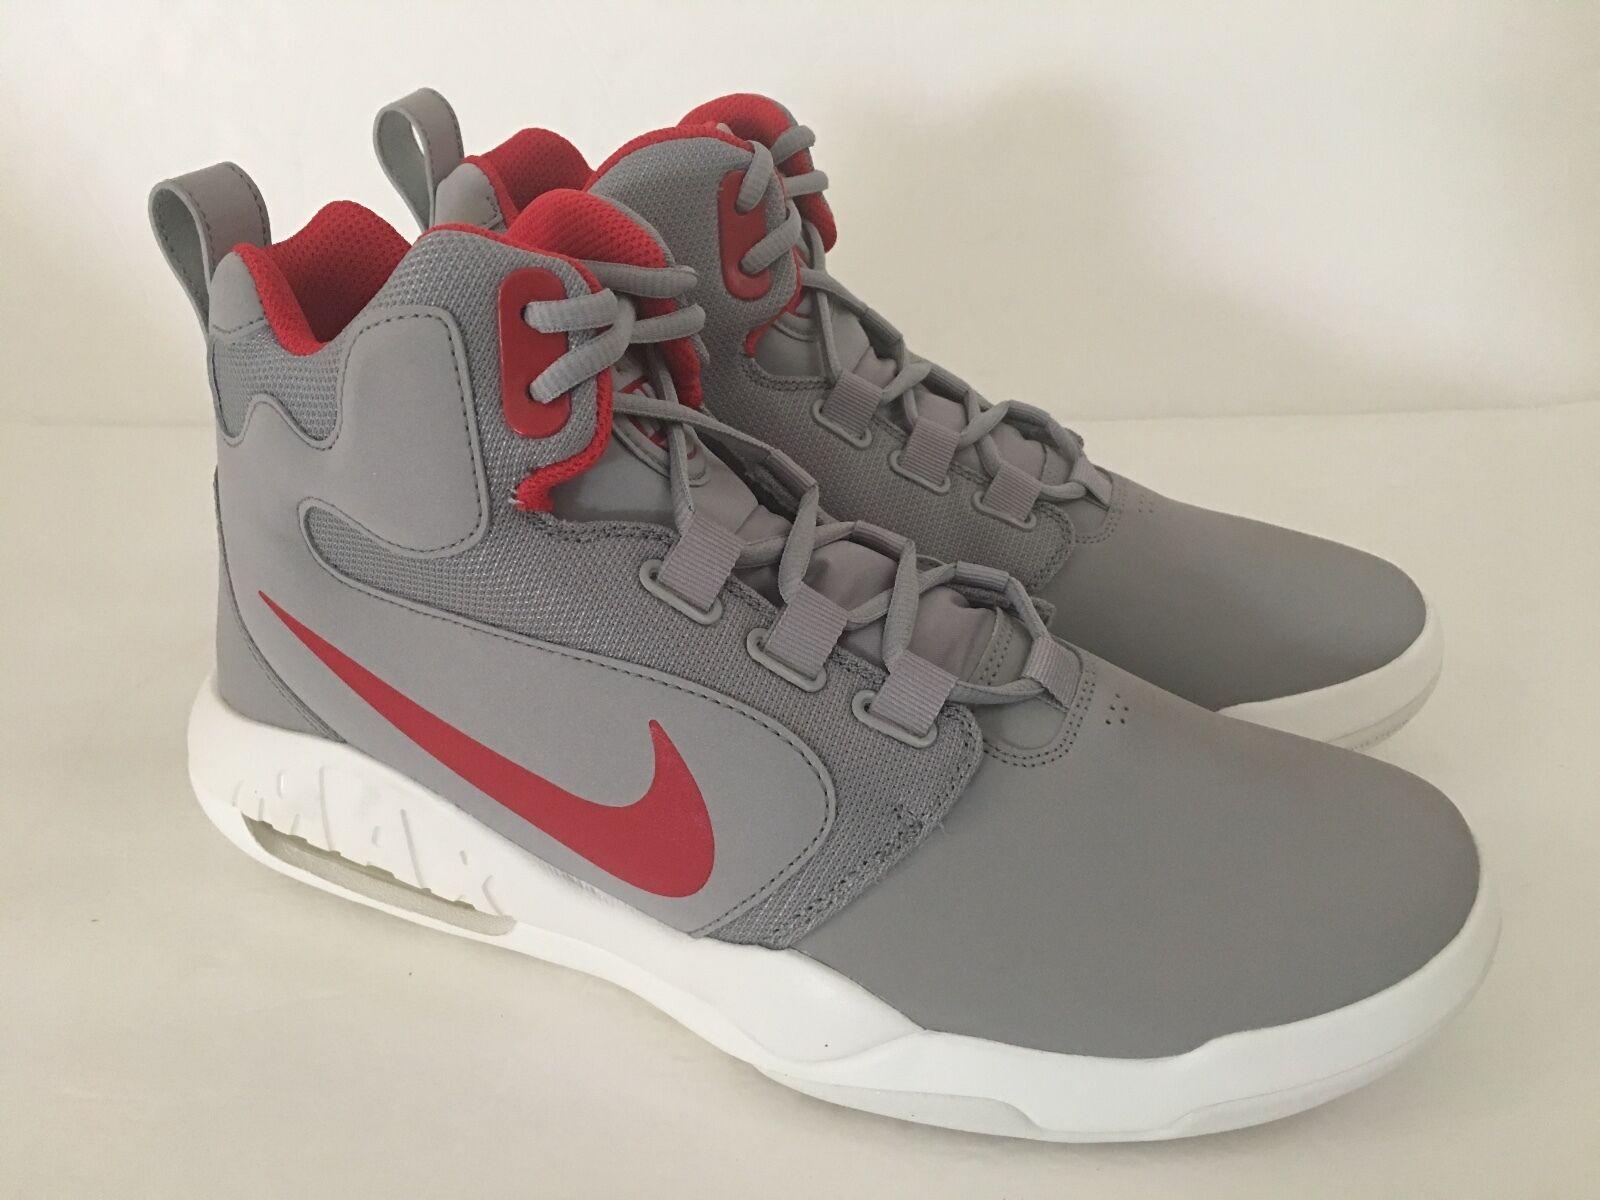 Men's Nike Basketball Shoes Sneaker Silver 10 M Air Conversion 861678 004